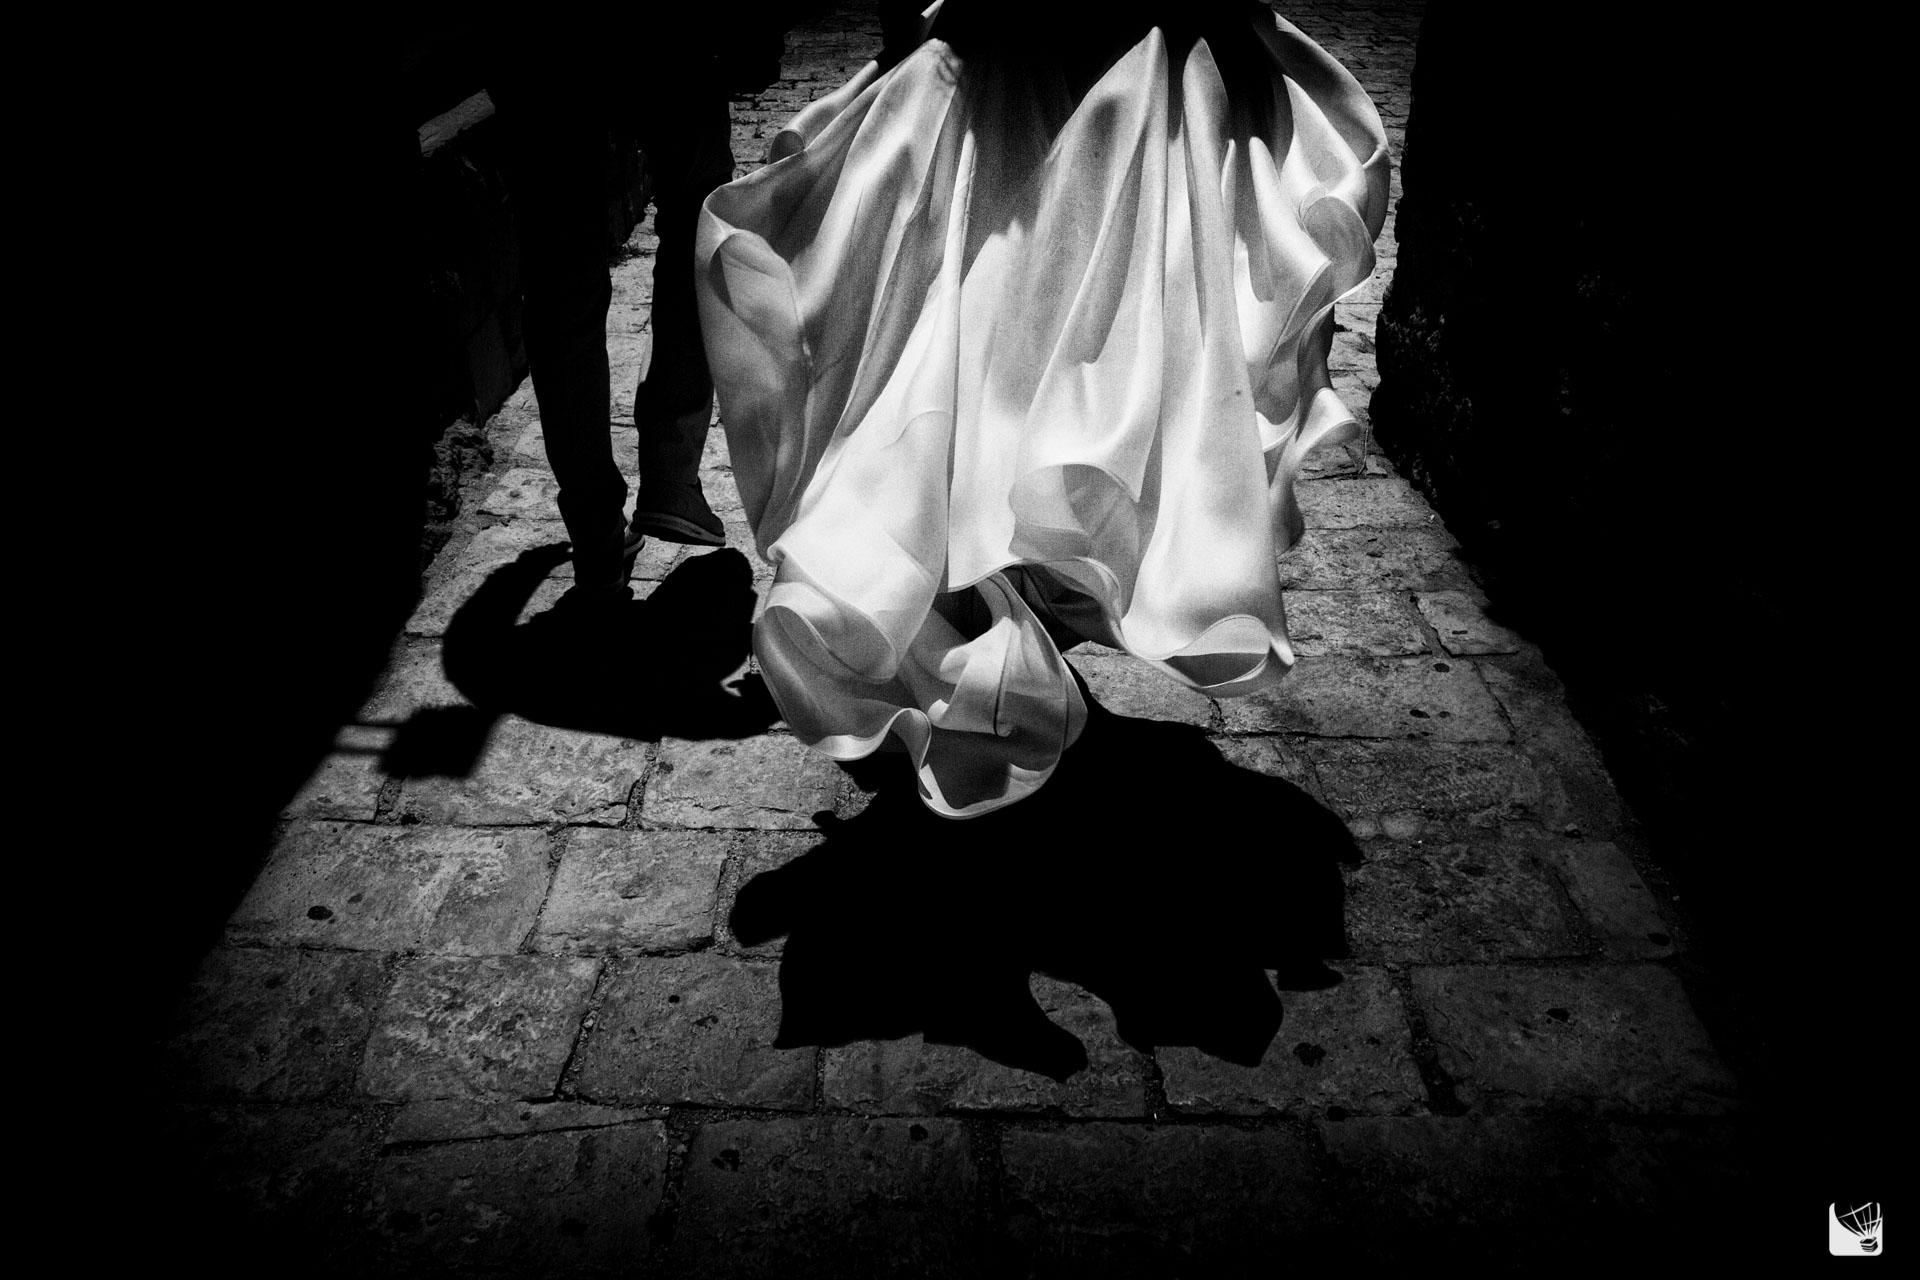 wedding_in_marzamemi-31.jpg